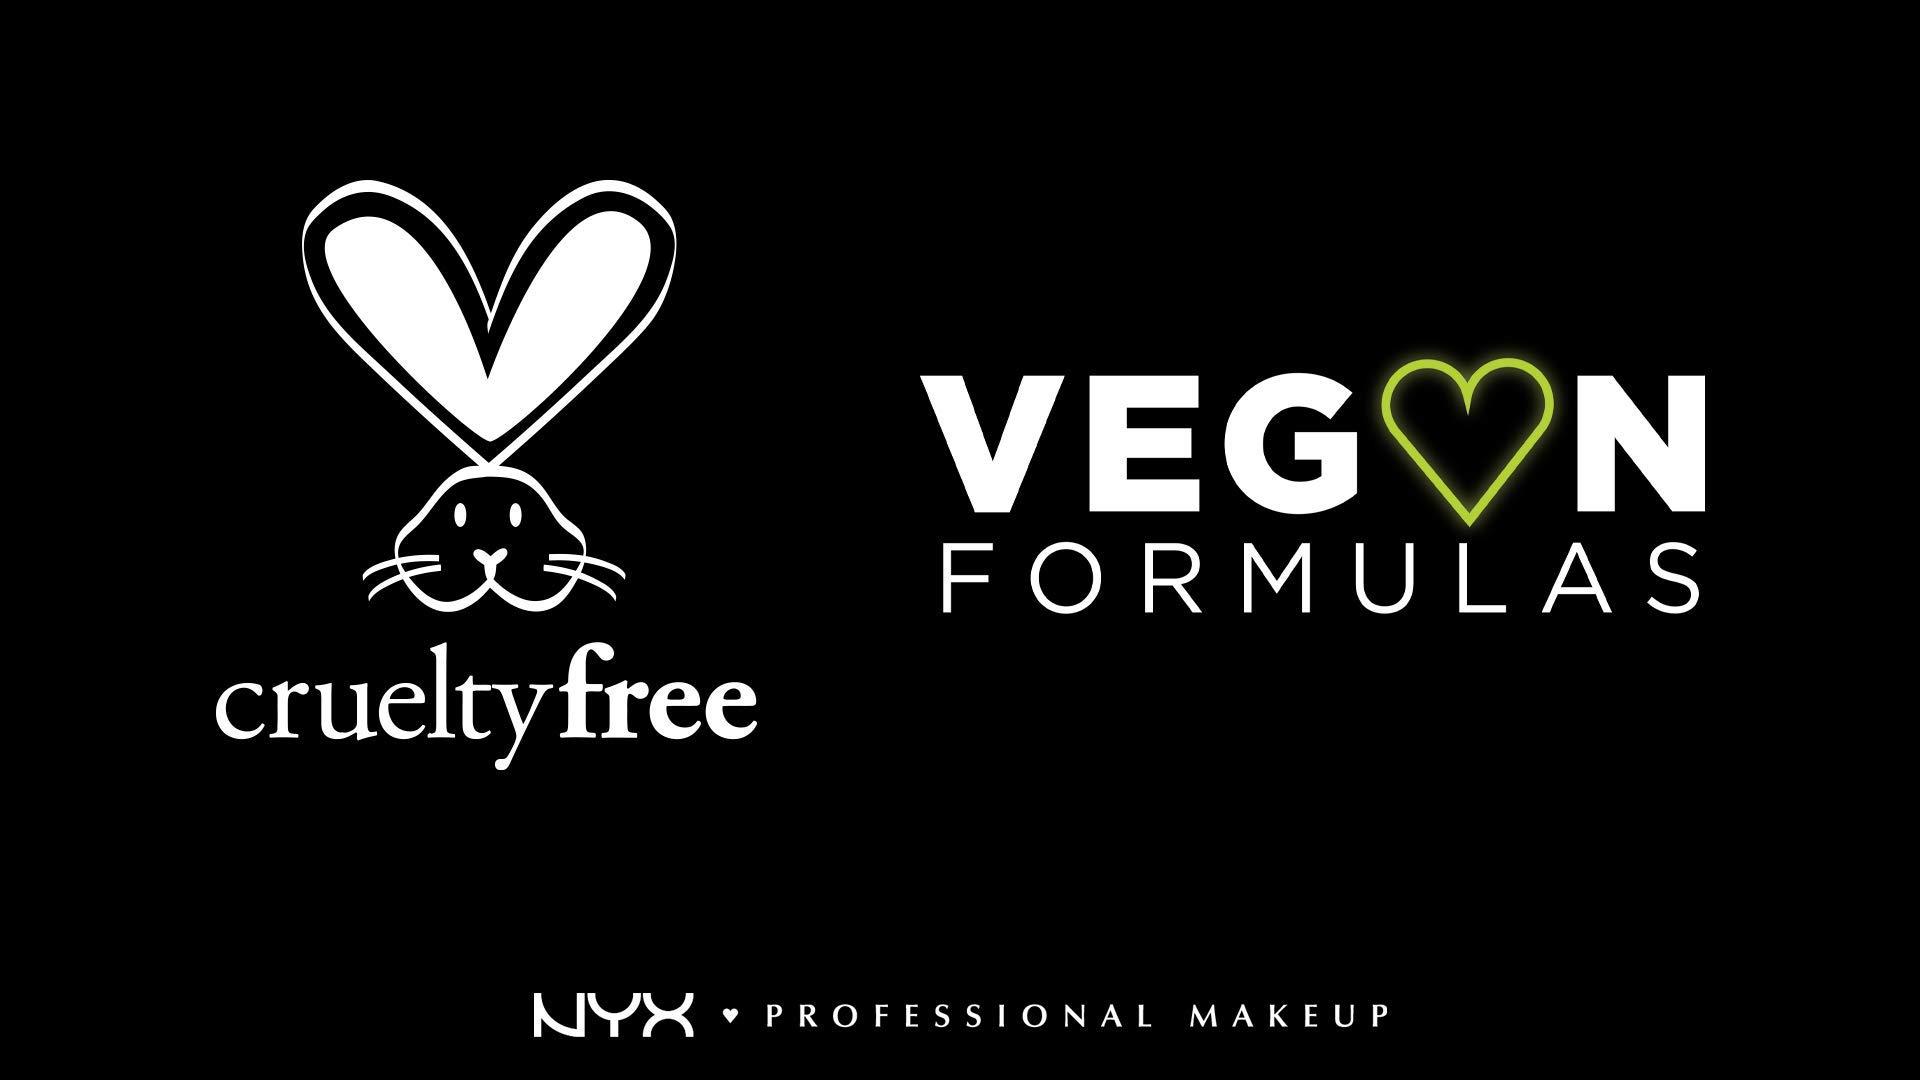 NYX PROFESSIONAL MAKEUP Powder Puff Lippie Lip Cream, Liquid Lipstick - Group Love (True Red)